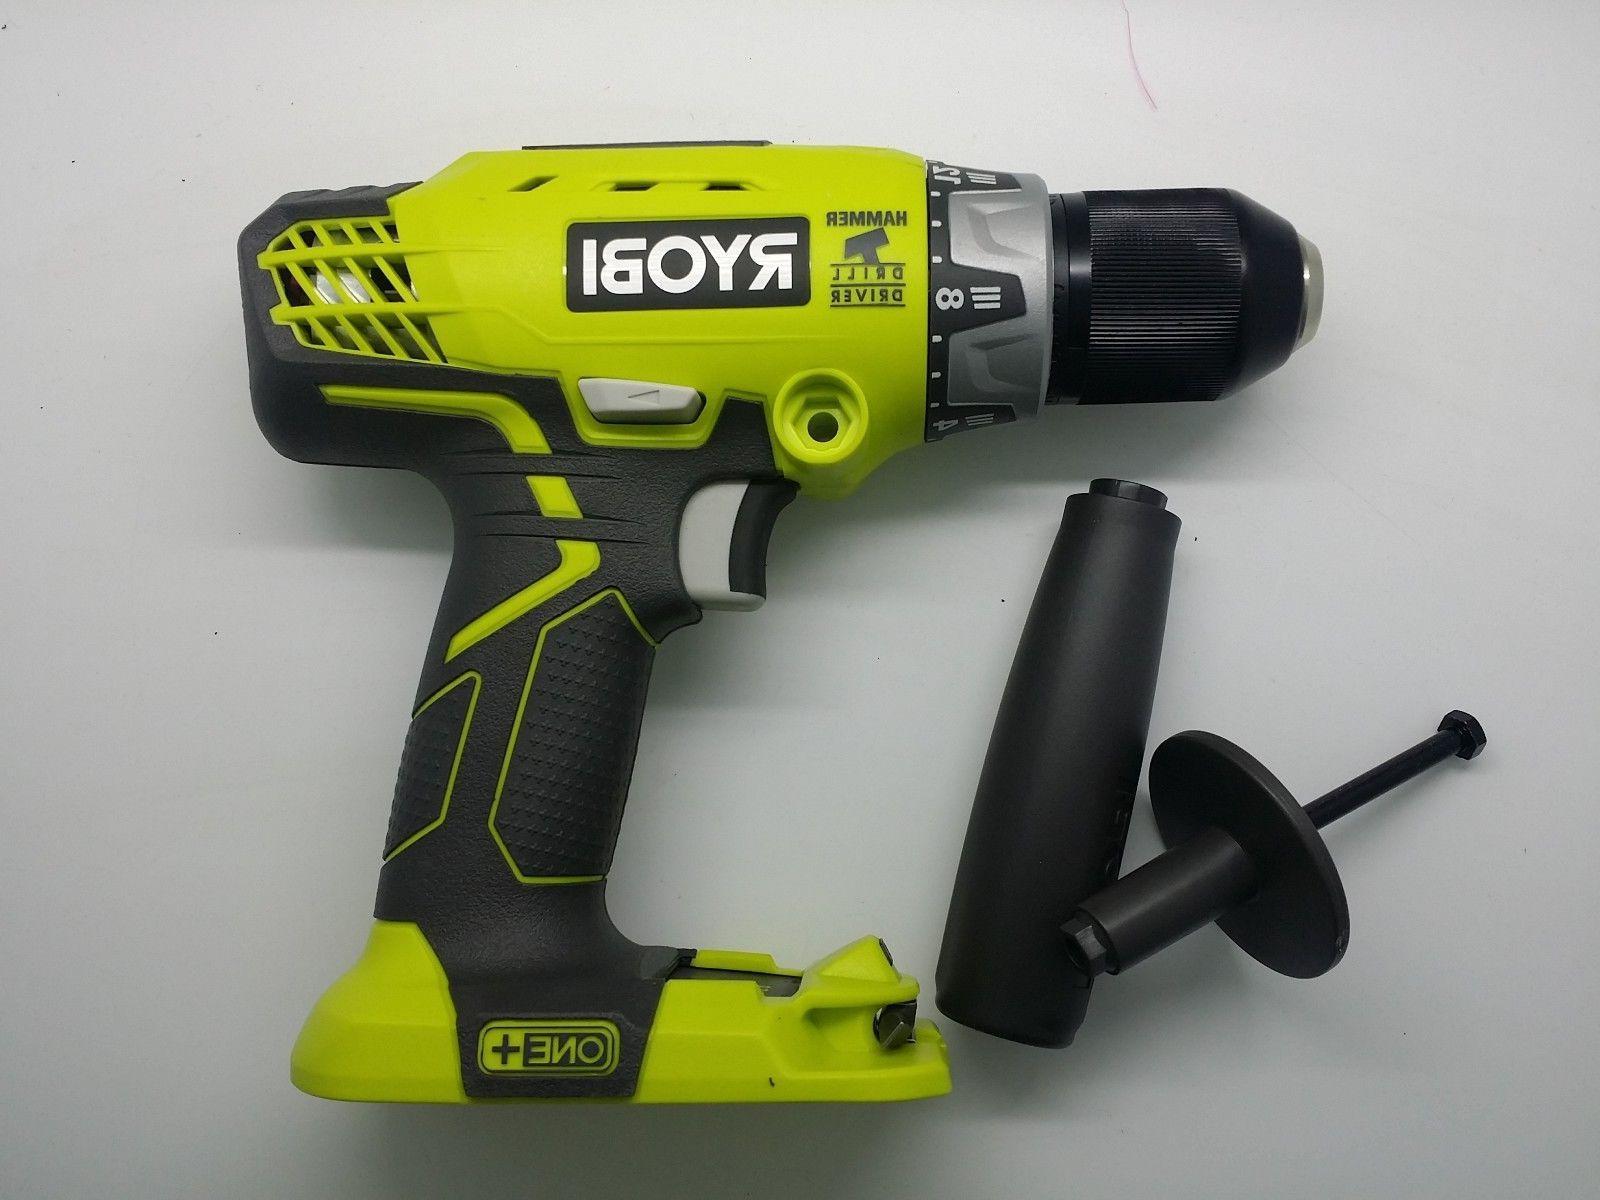 New Ryobi P214 ONE+ 18-Volt LI-ION 1/2 in. Cordless Hammer D